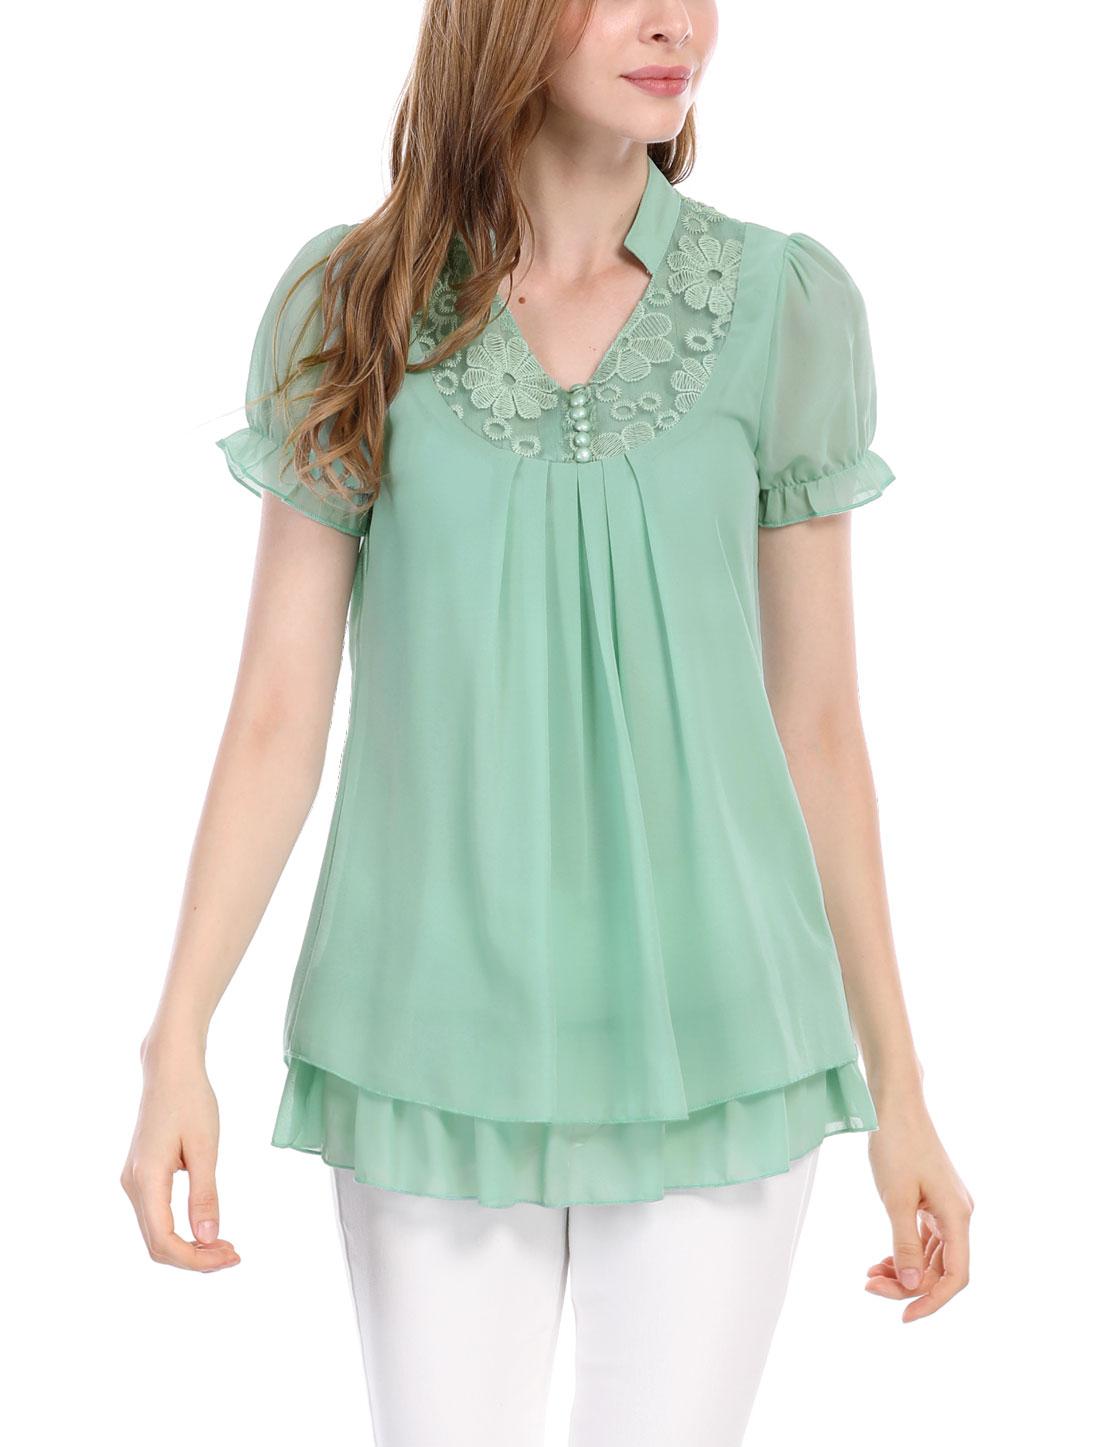 Women Short Sleeves Flounce Layered Tunic Shirts Green XL